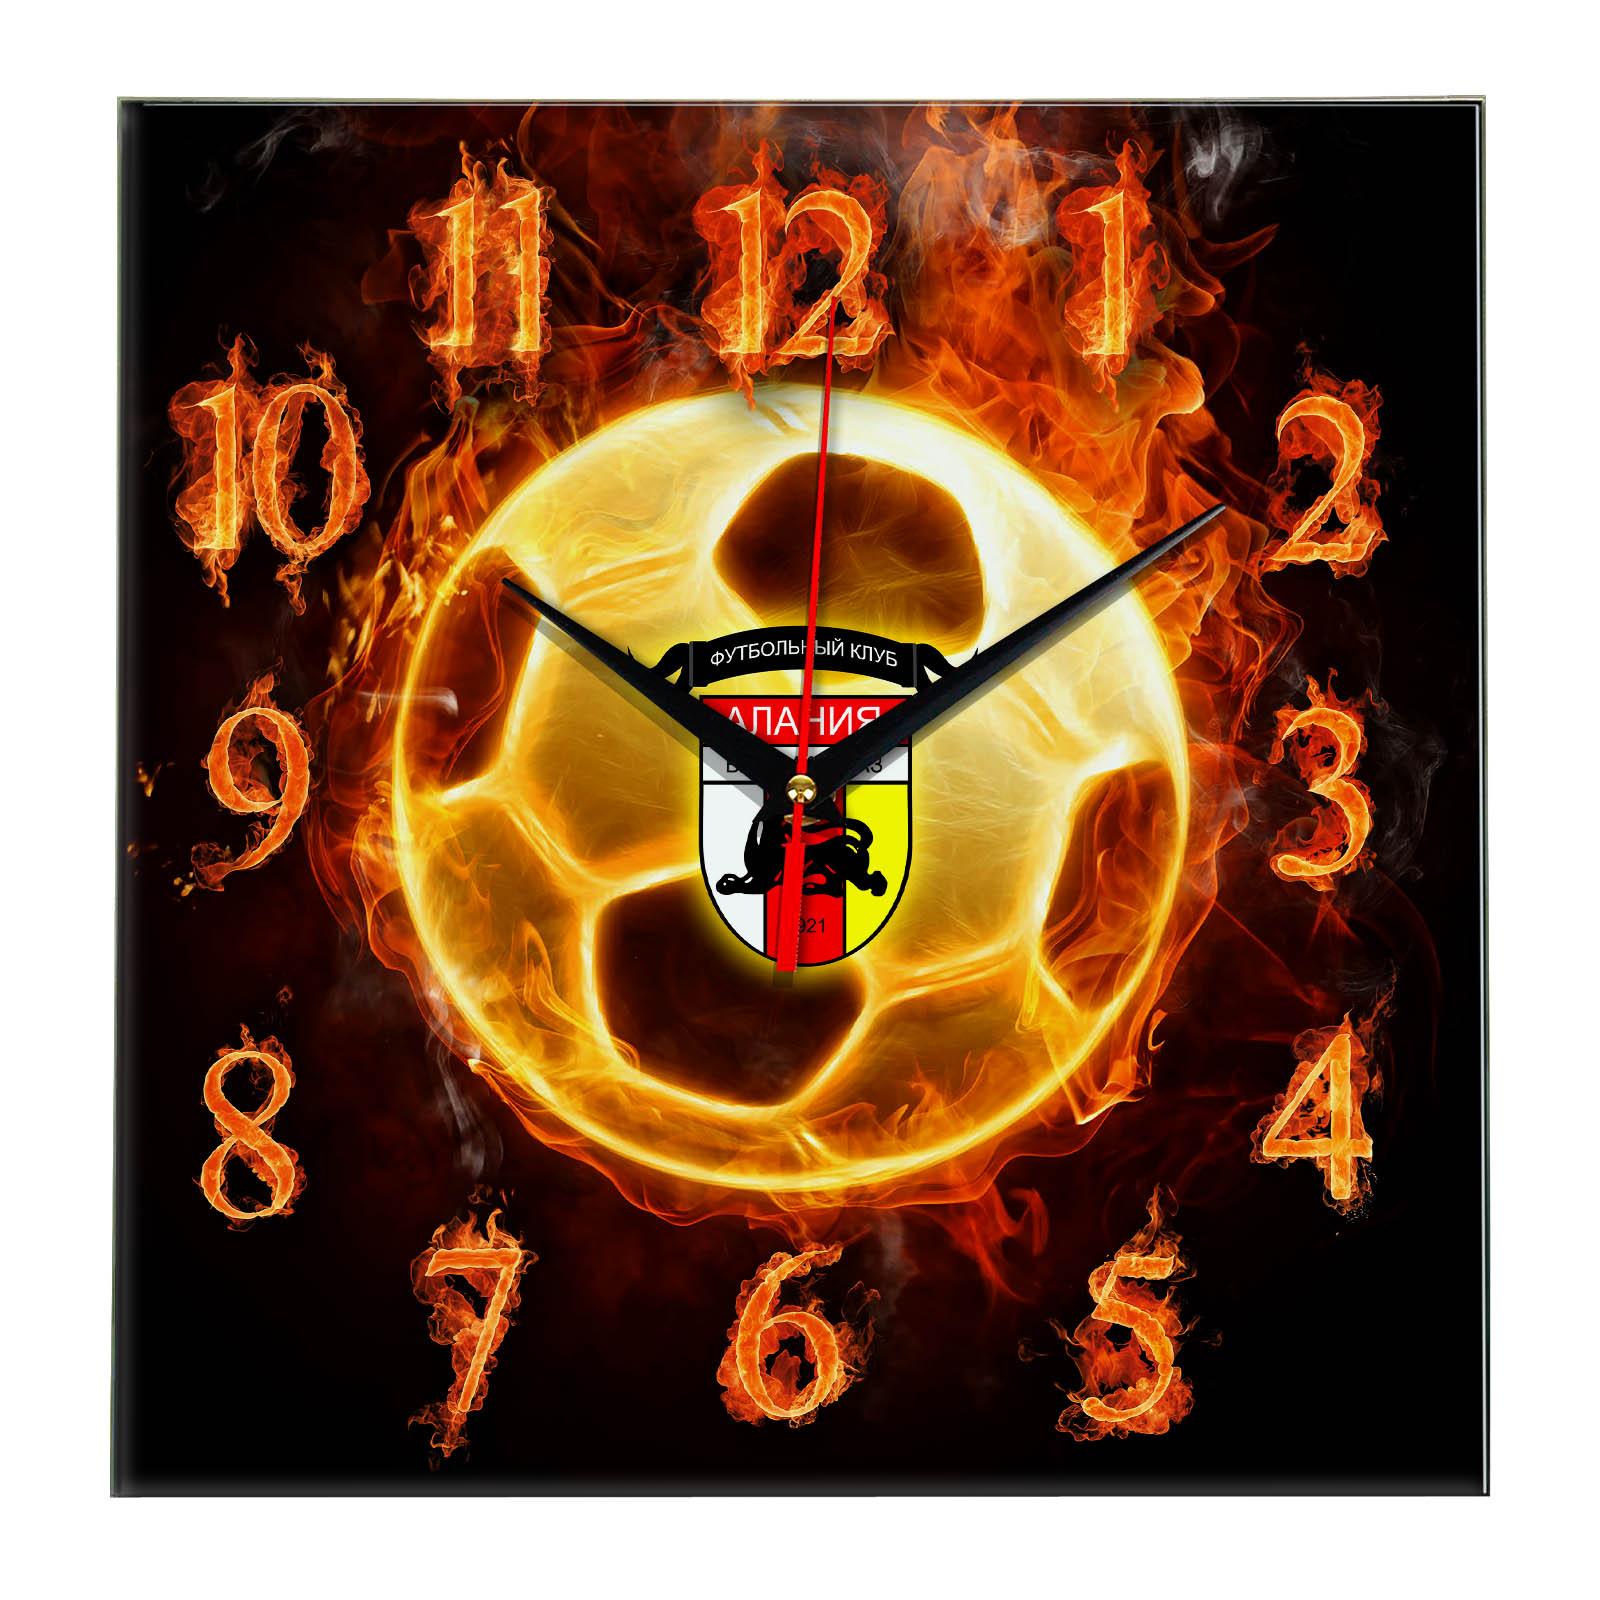 Настенные часы «Огненный футболист ALANIYA VLADIKAVKAZ»